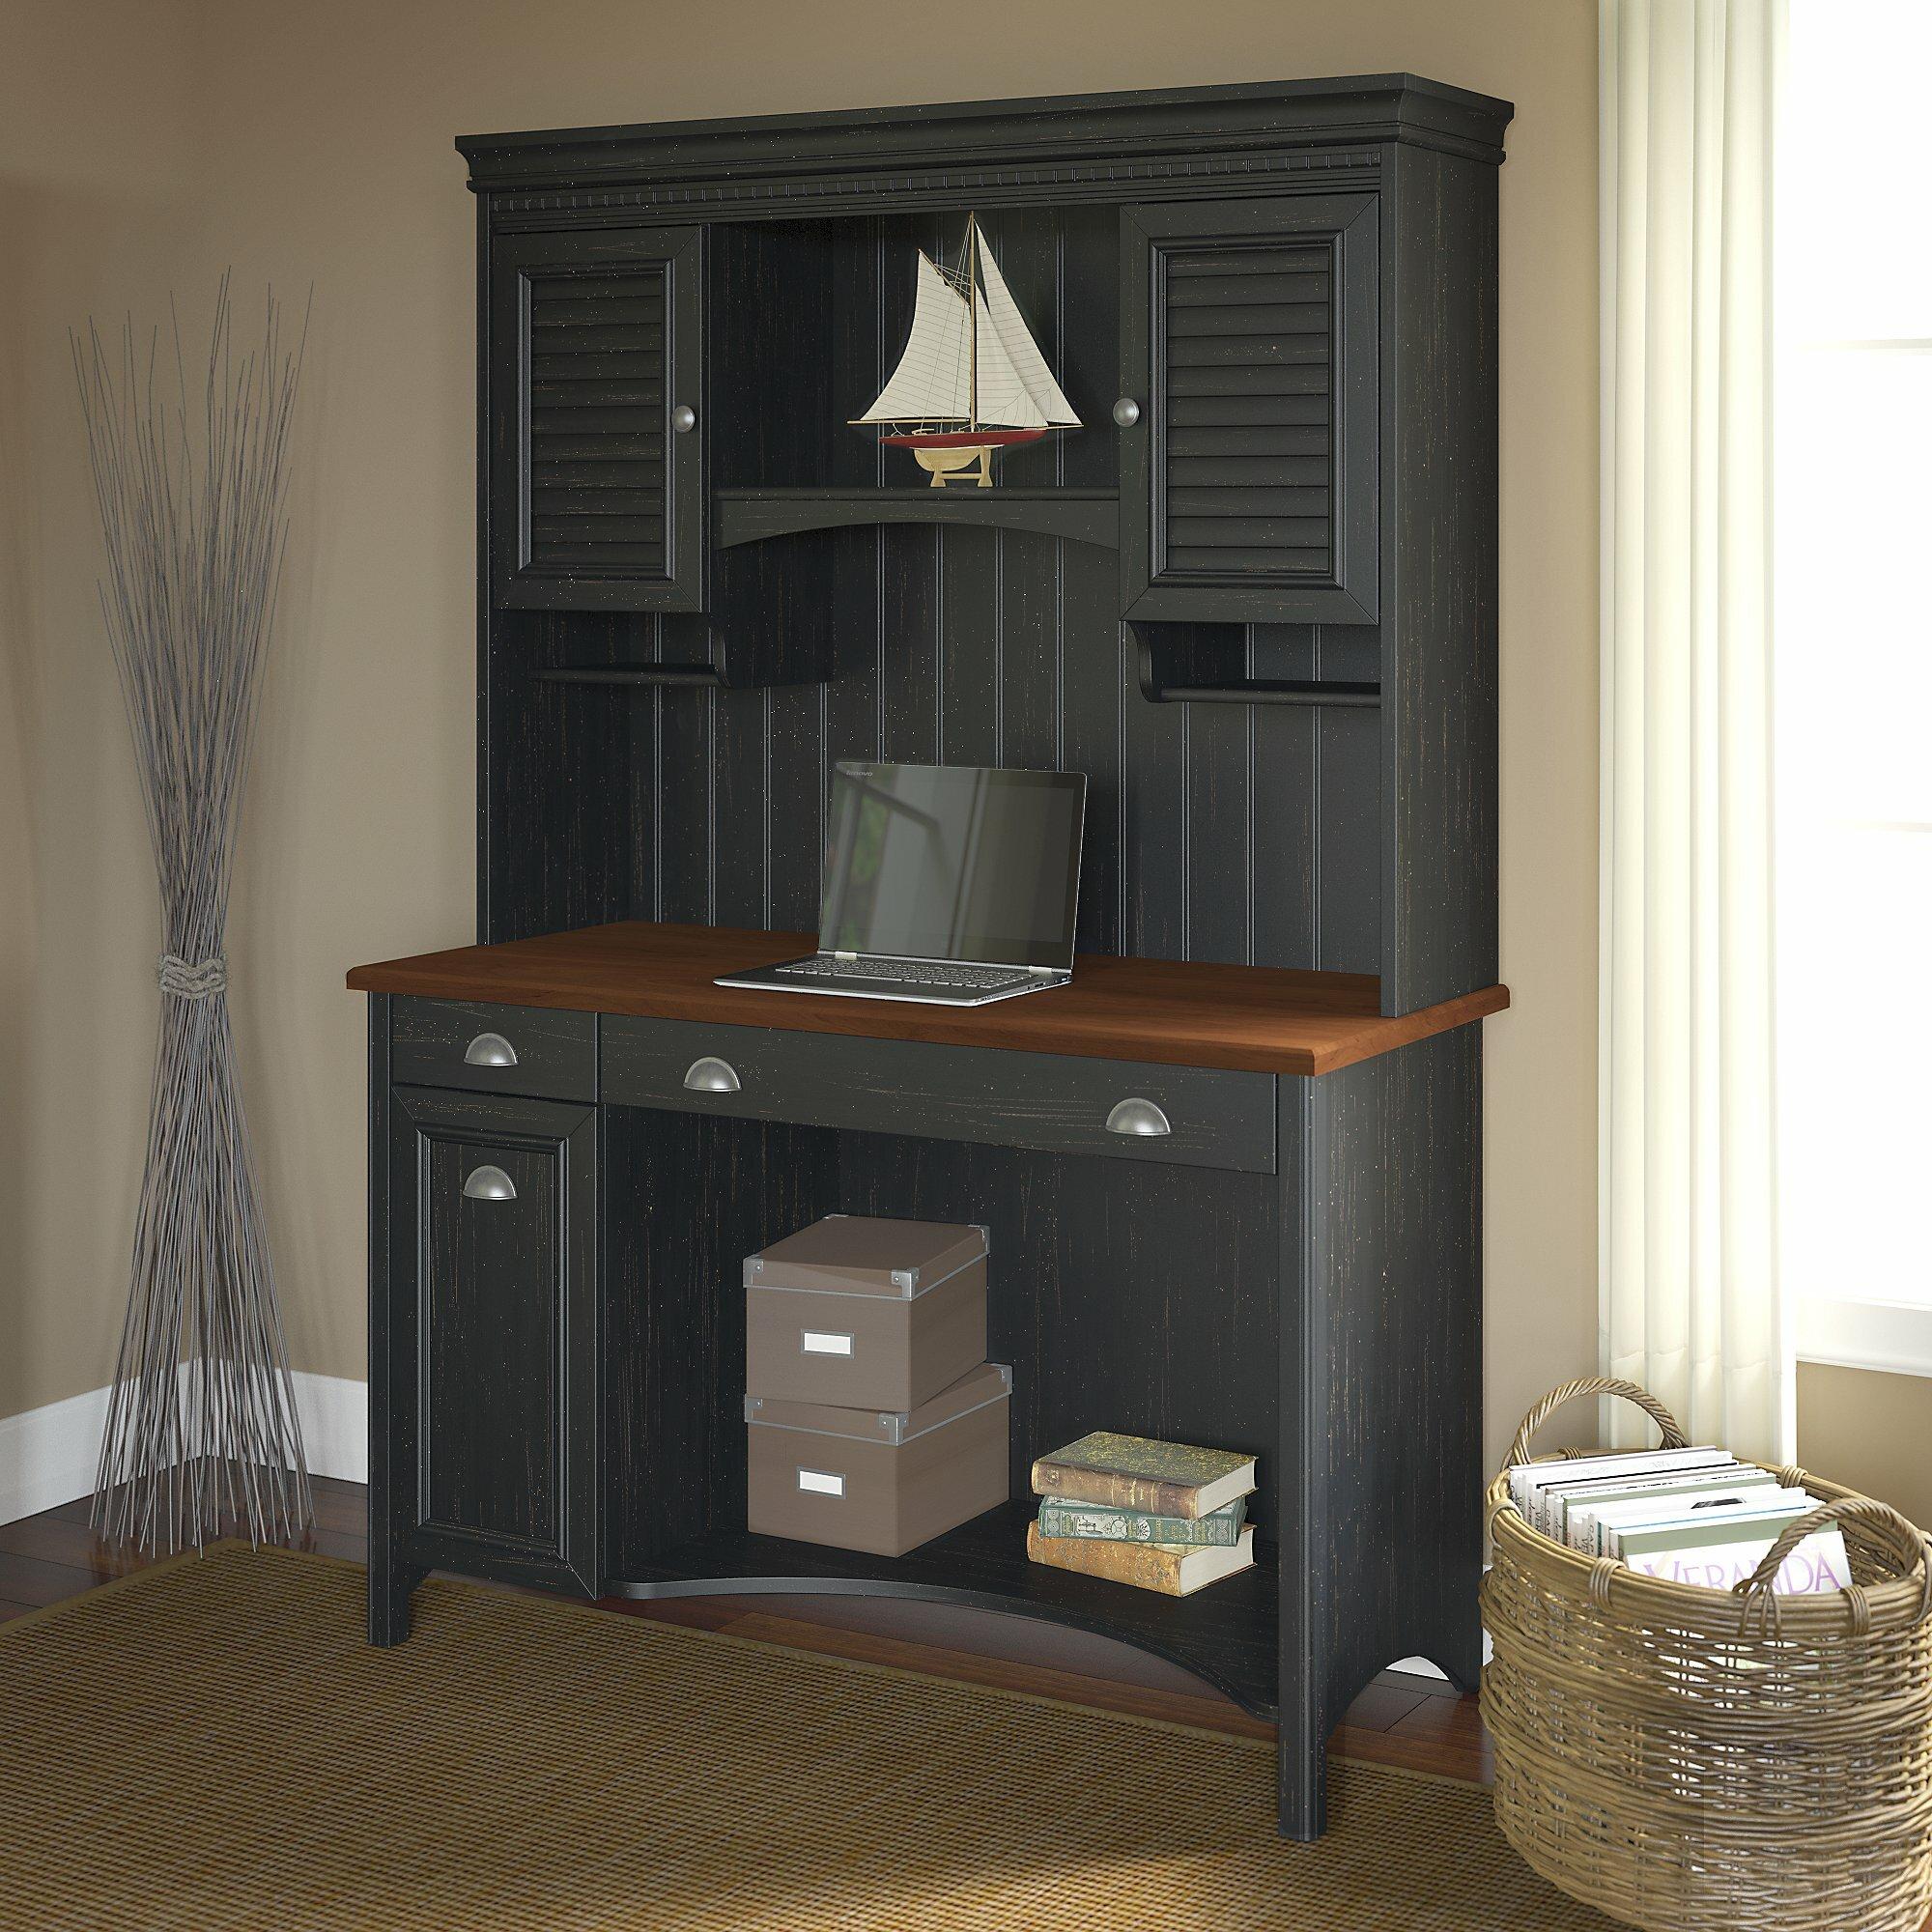 spokan drawers and computer hutch corner design with kitchen desk file sauder drawer